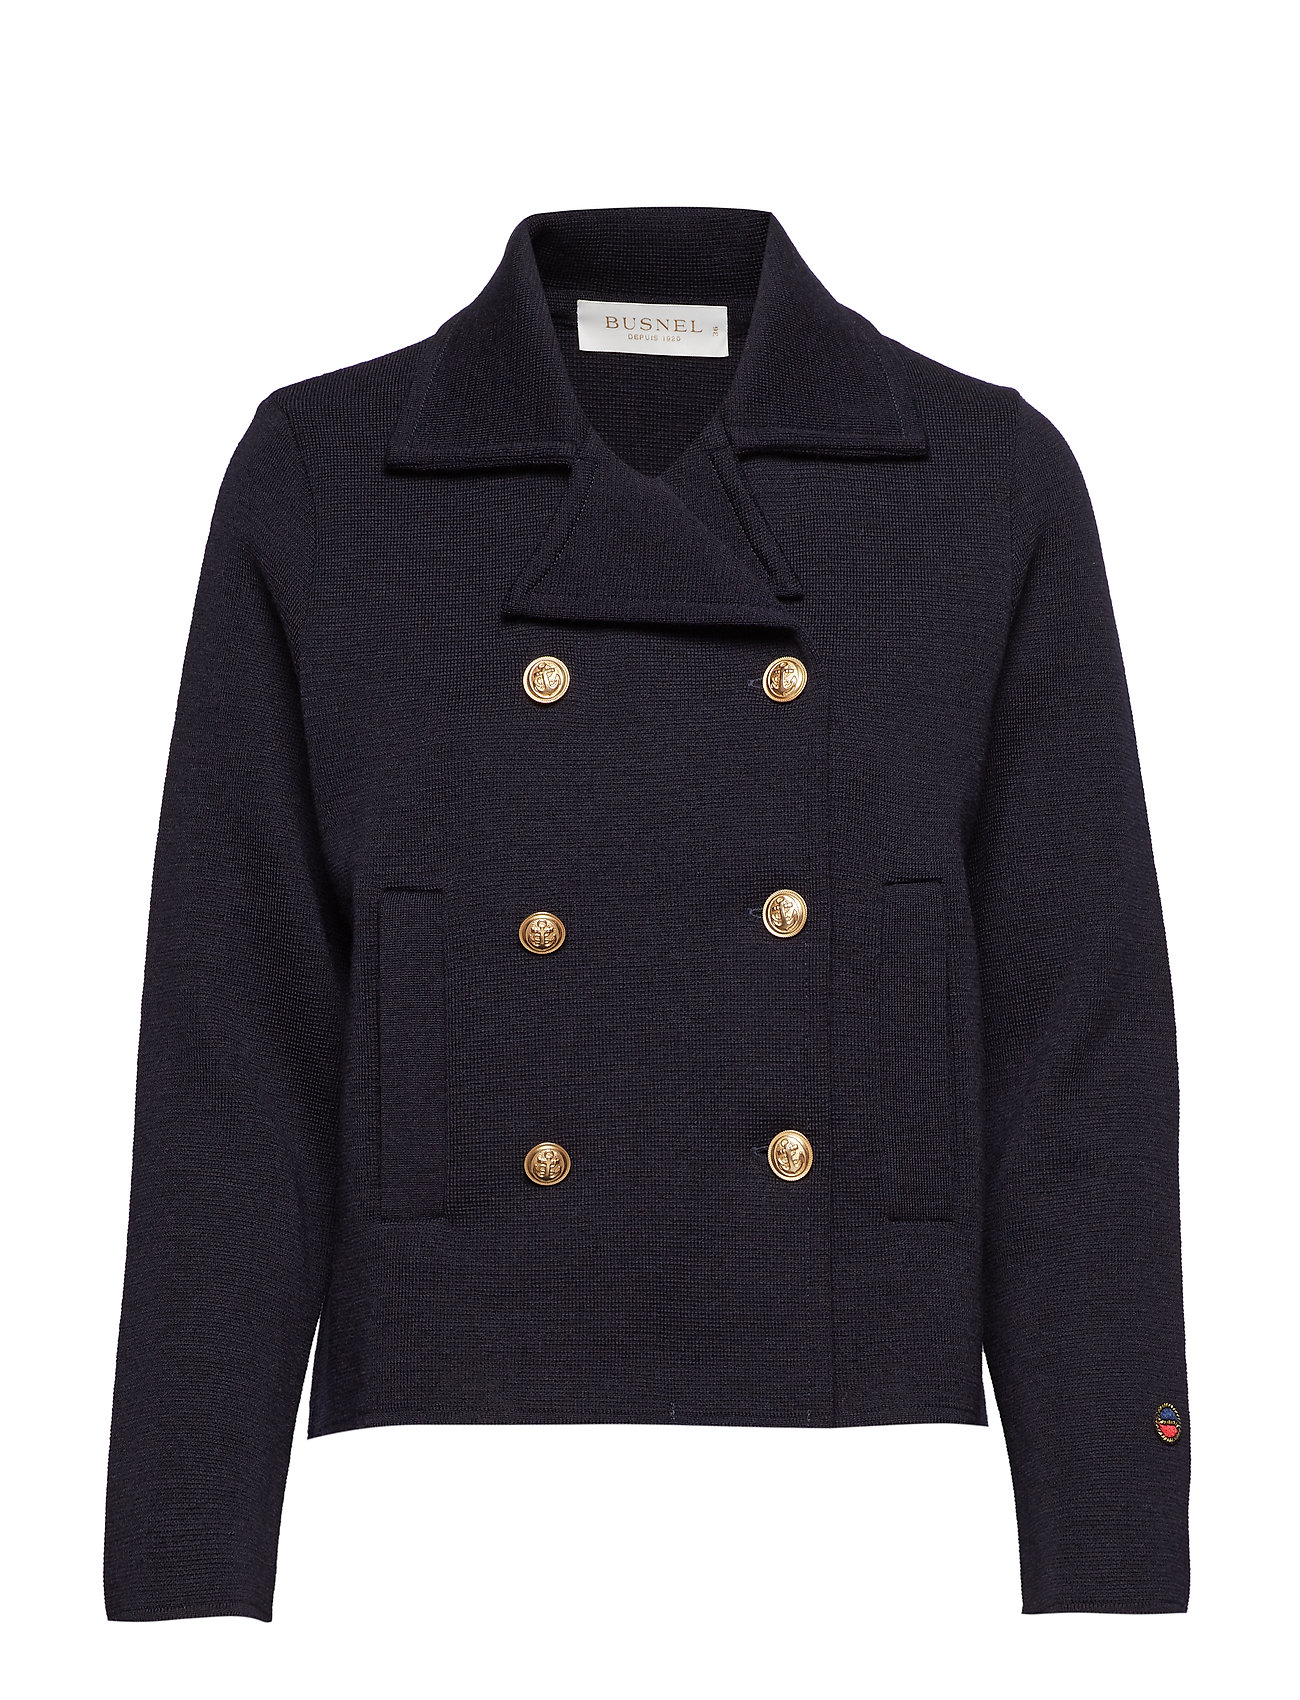 BUSNEL Indra jacket